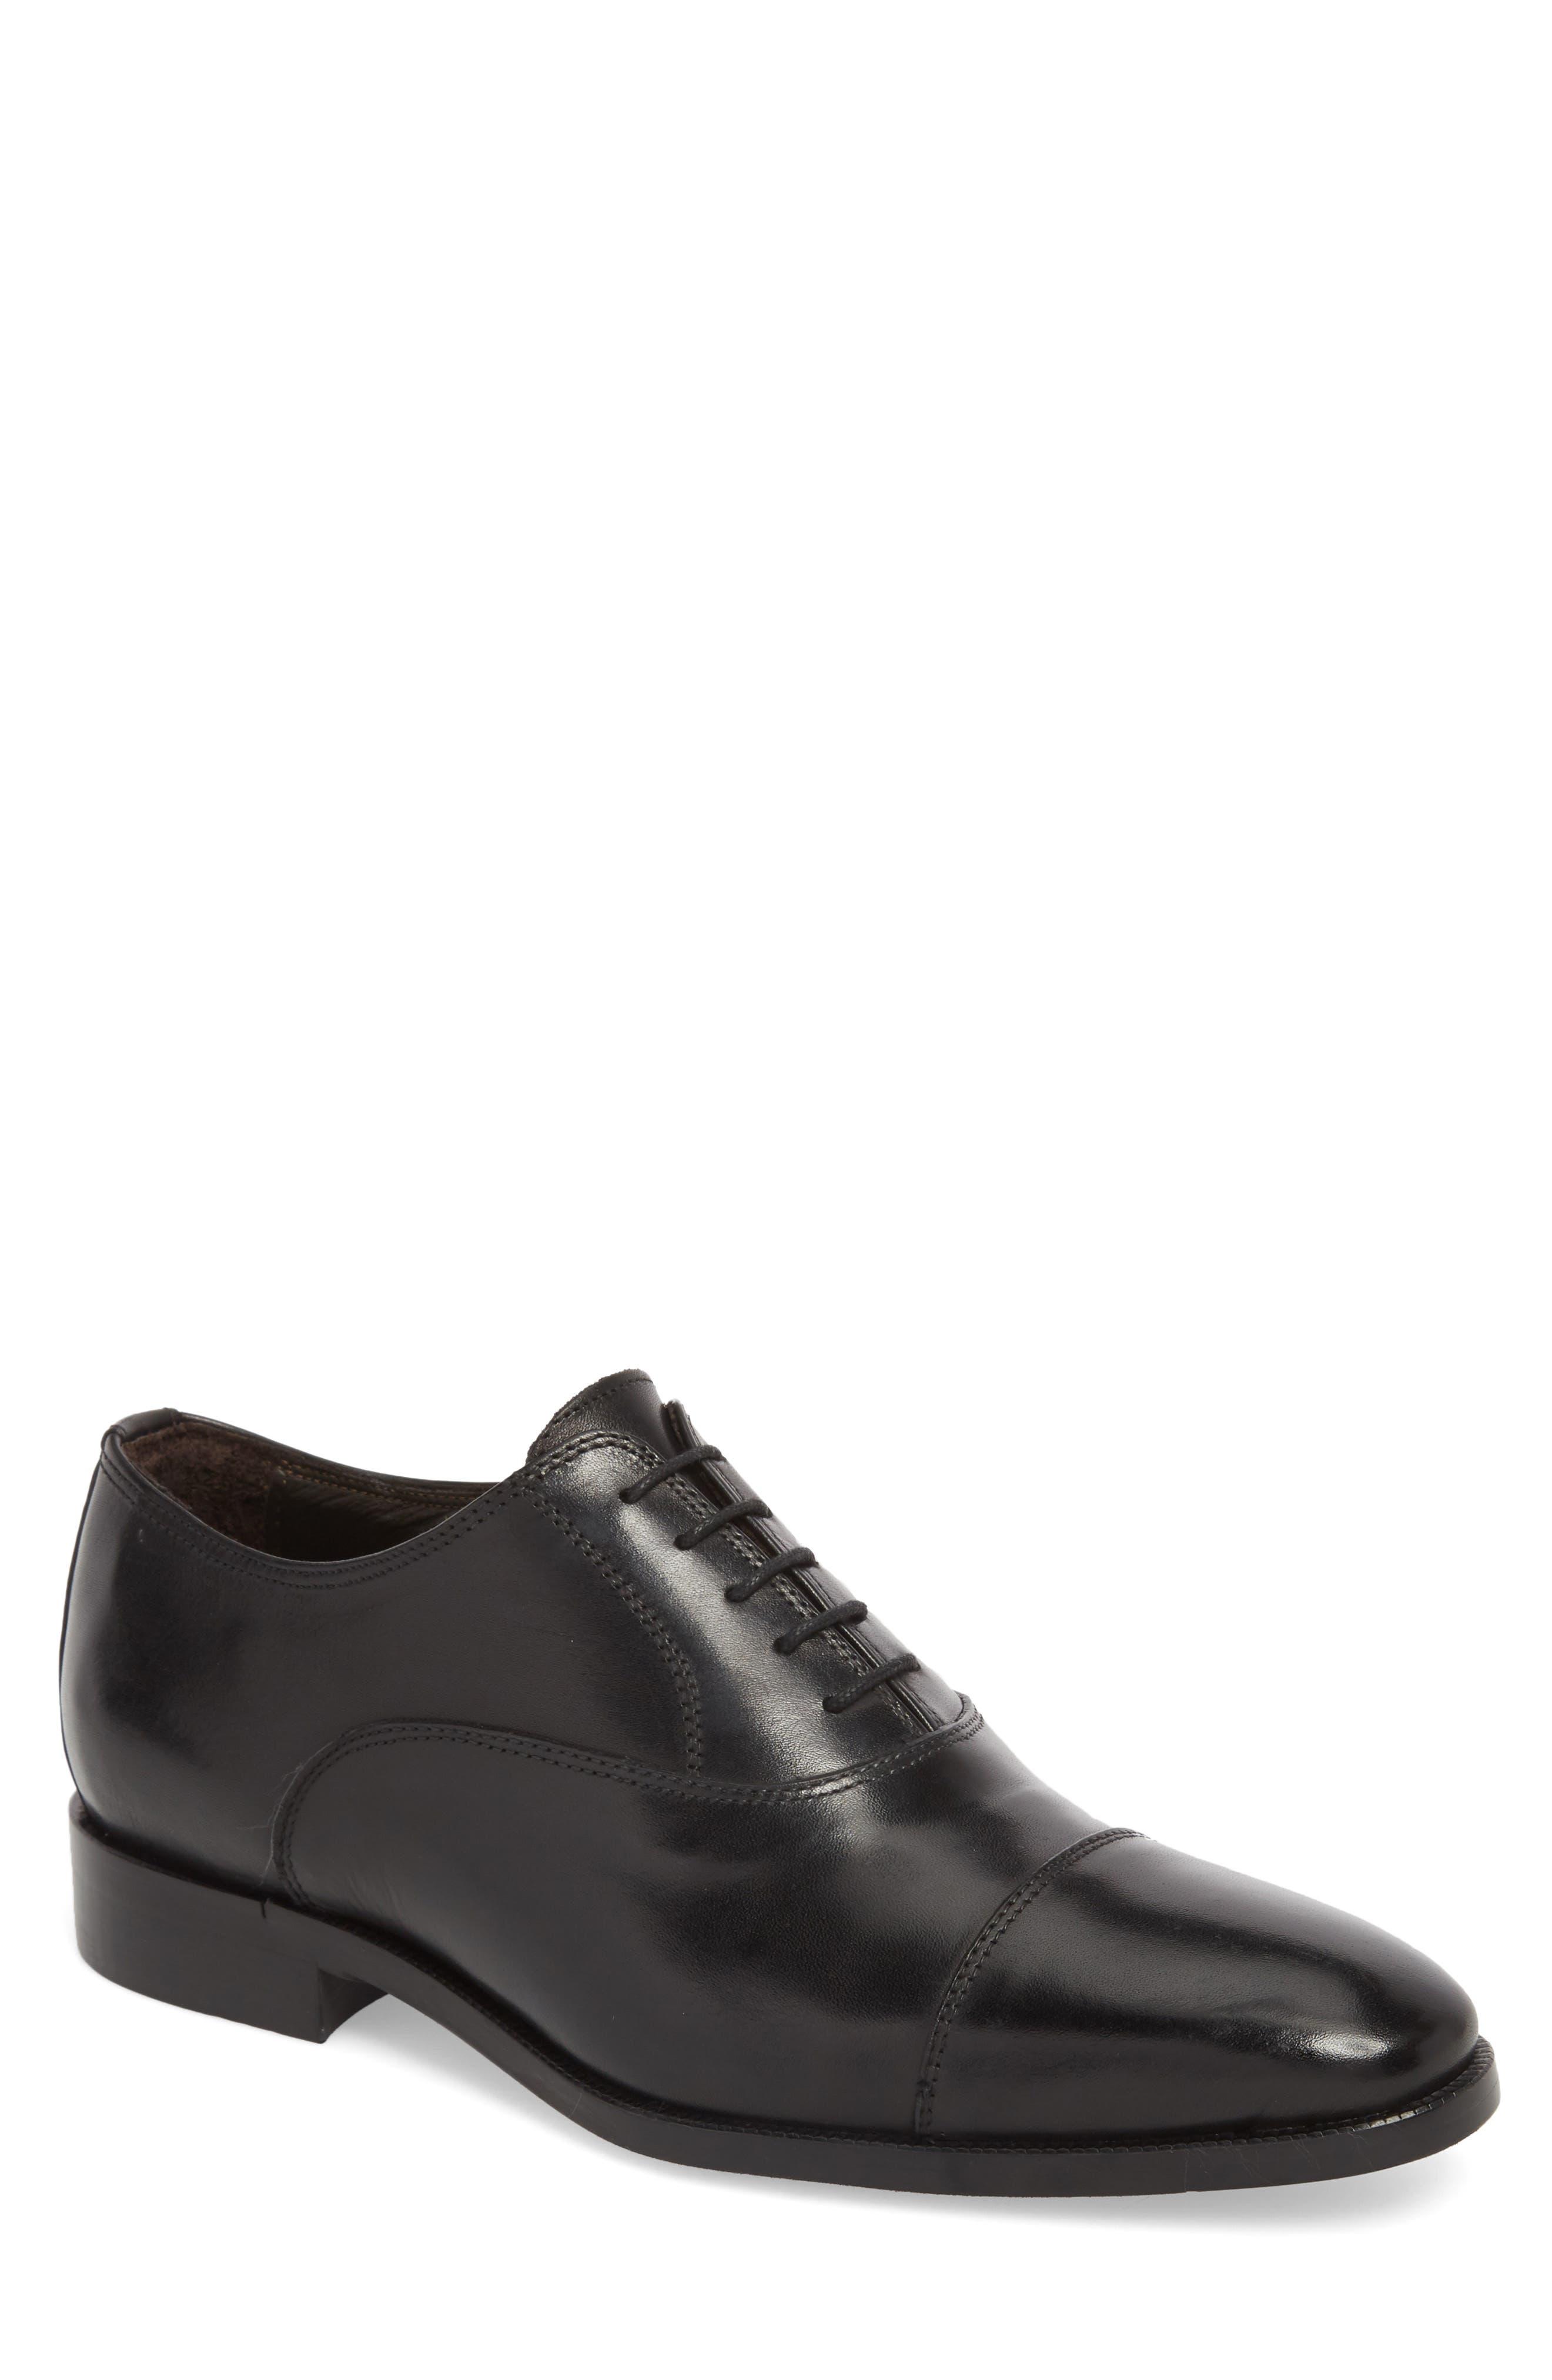 To Boot New York McKinley Cap Toe Oxford (Men)